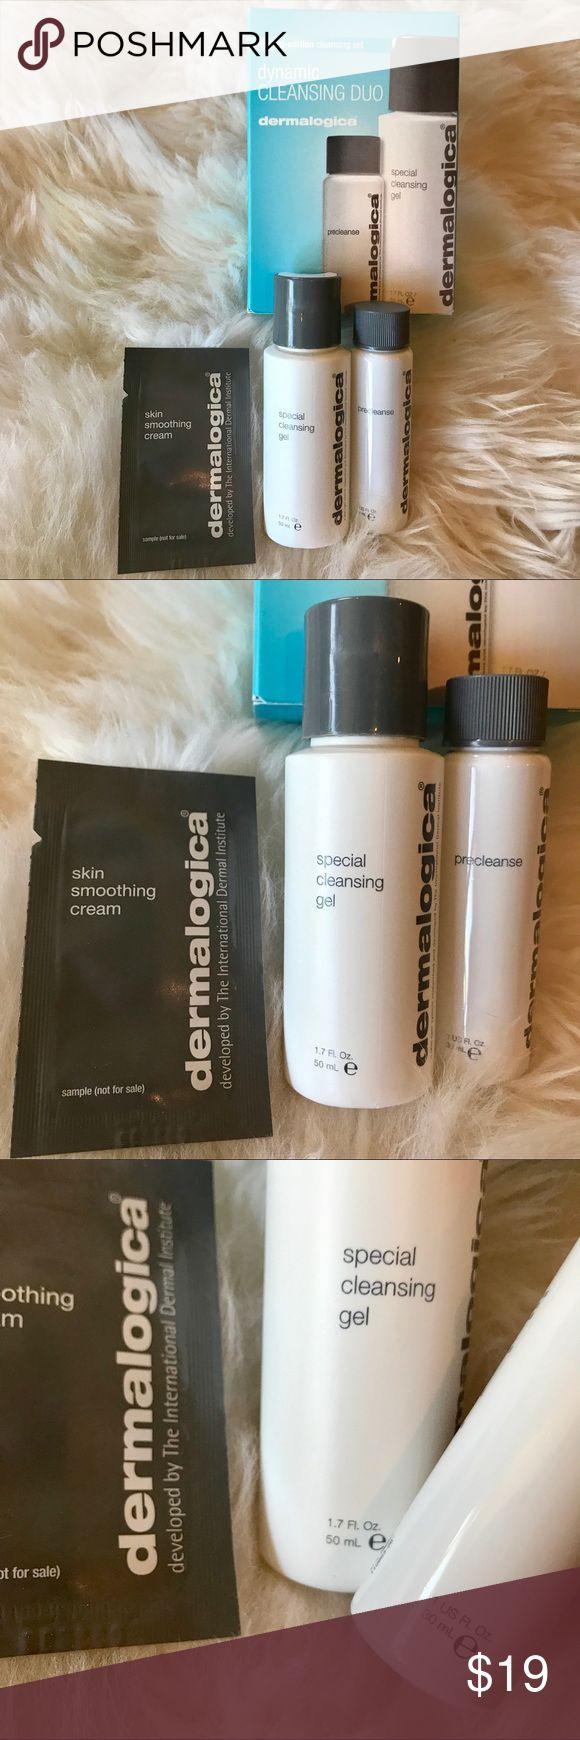 Dermalogica cleansing duo & skin smoothing cream Dermalogica dynamic cleansing duo & skin smoothing cream. Travel size. dermalogica Makeup